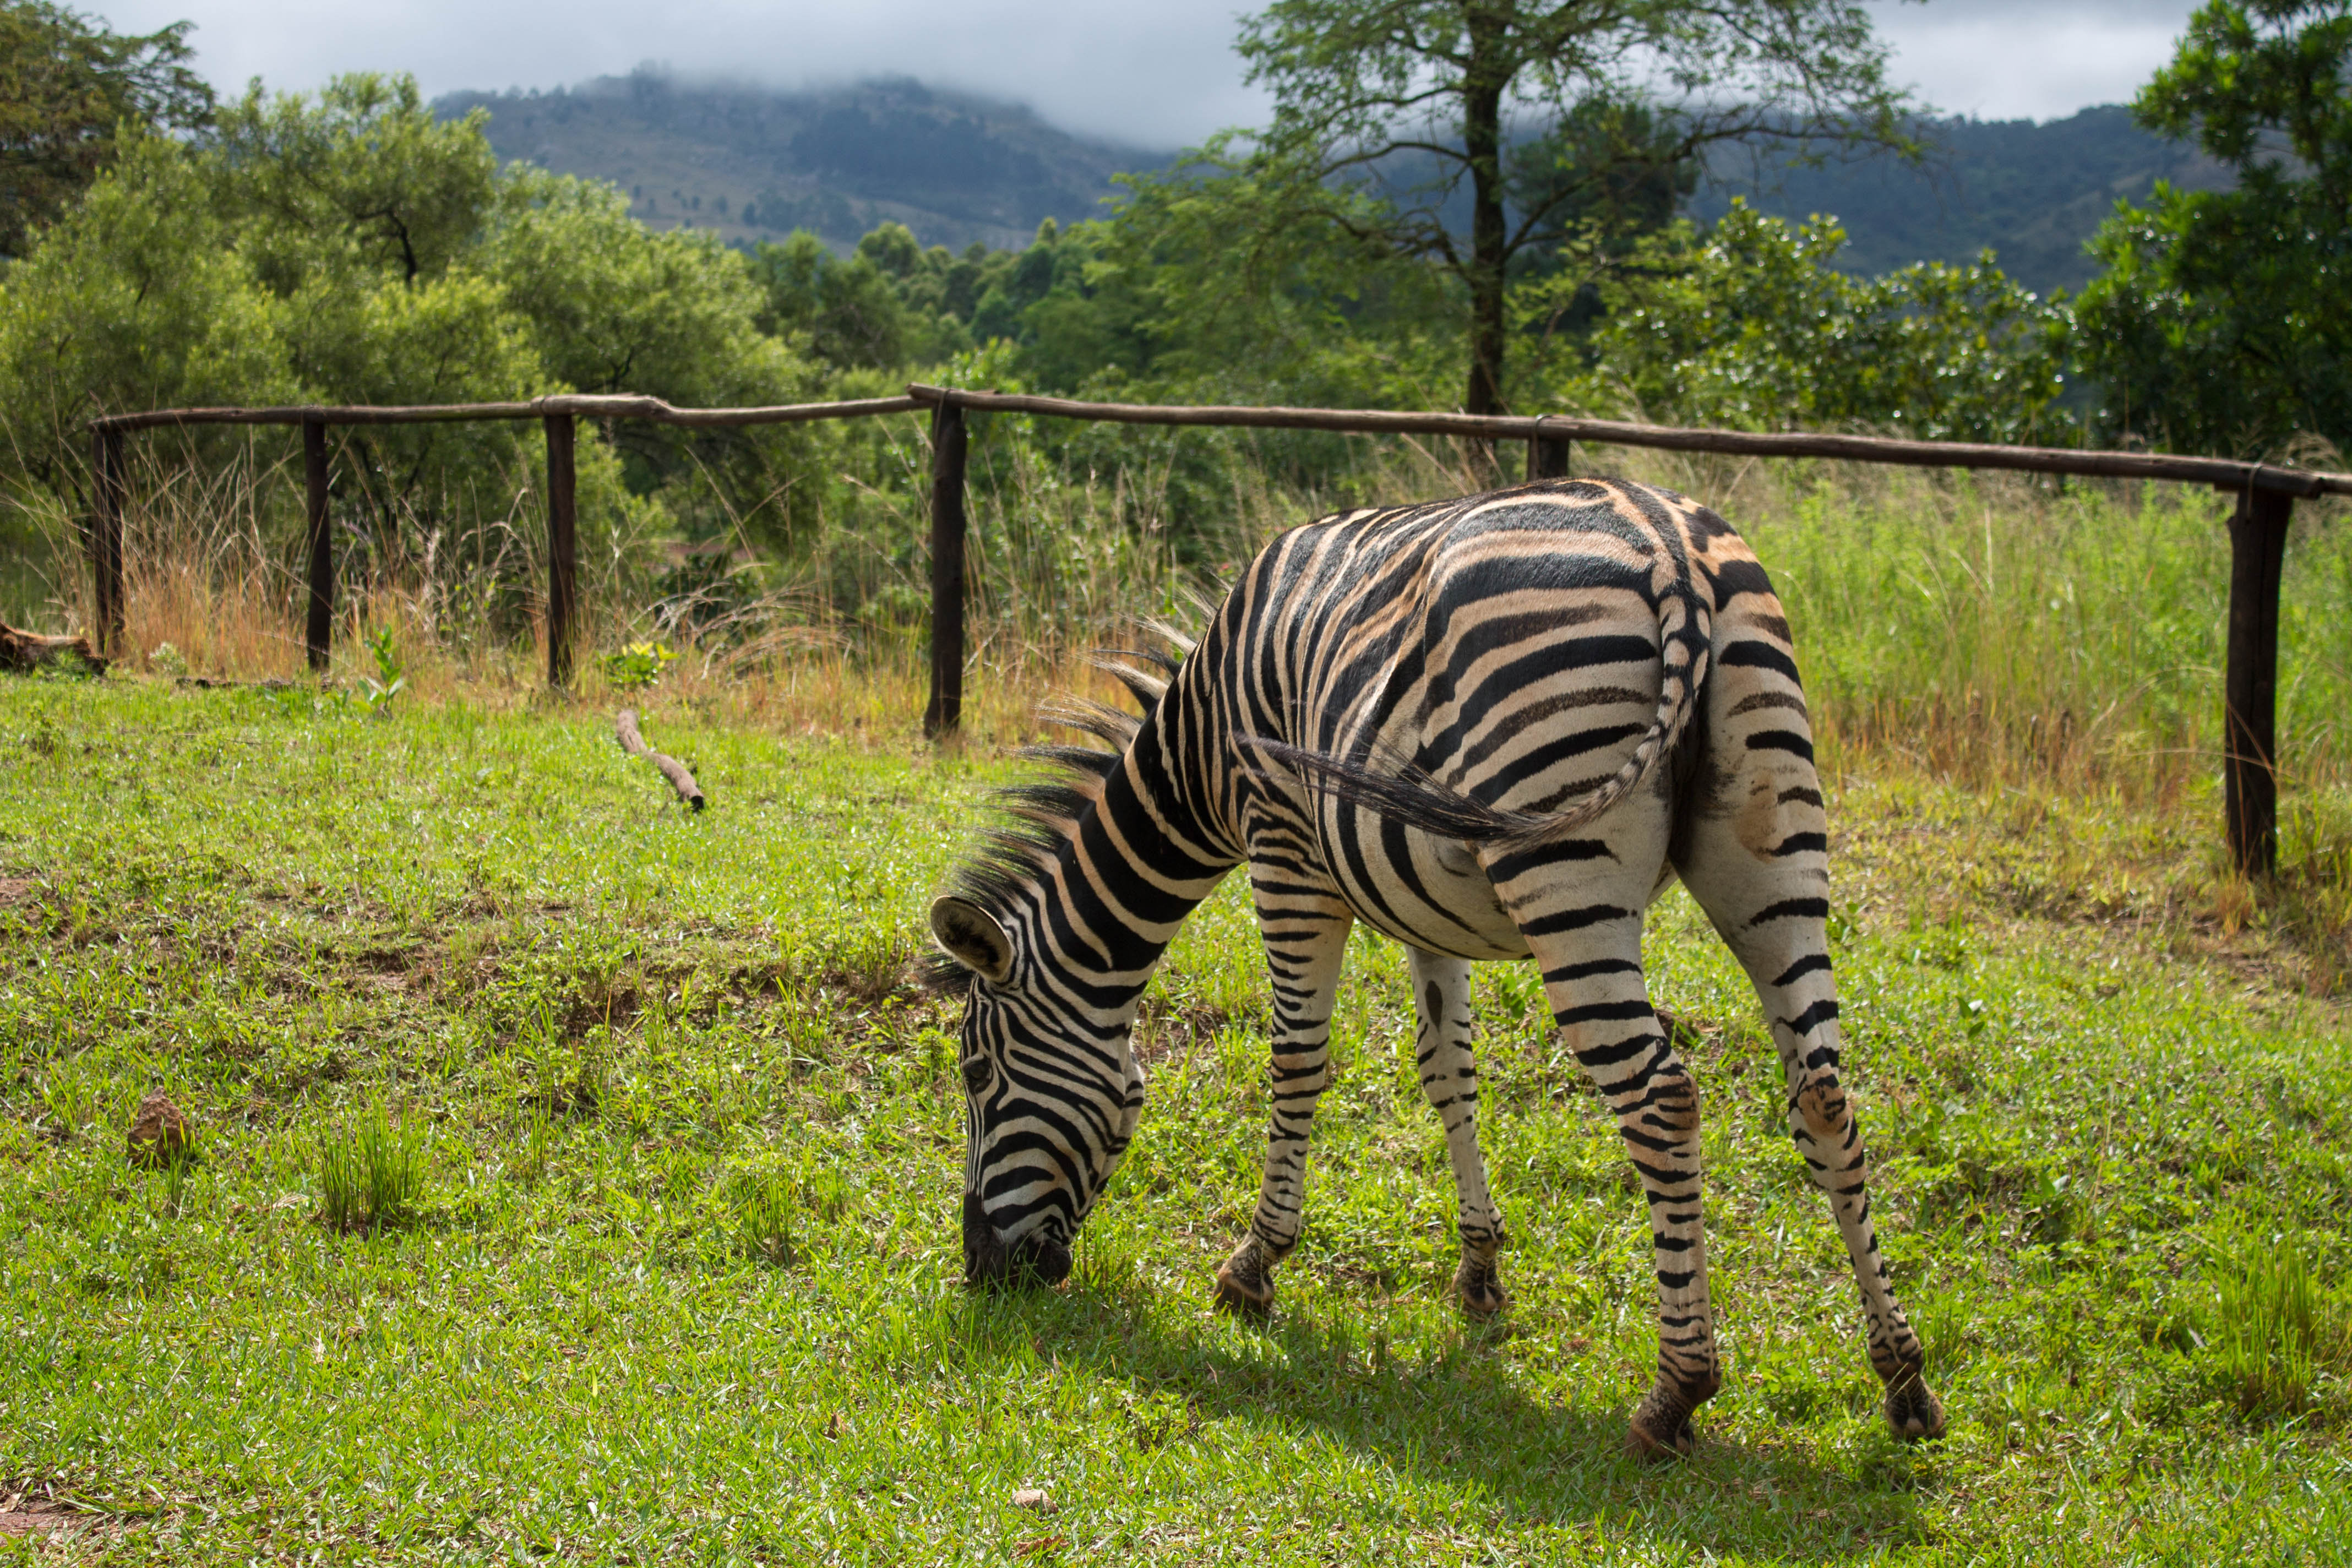 Mlilwane Wildlife sanctuary - itinerari de 3 dies a Swazilàndia